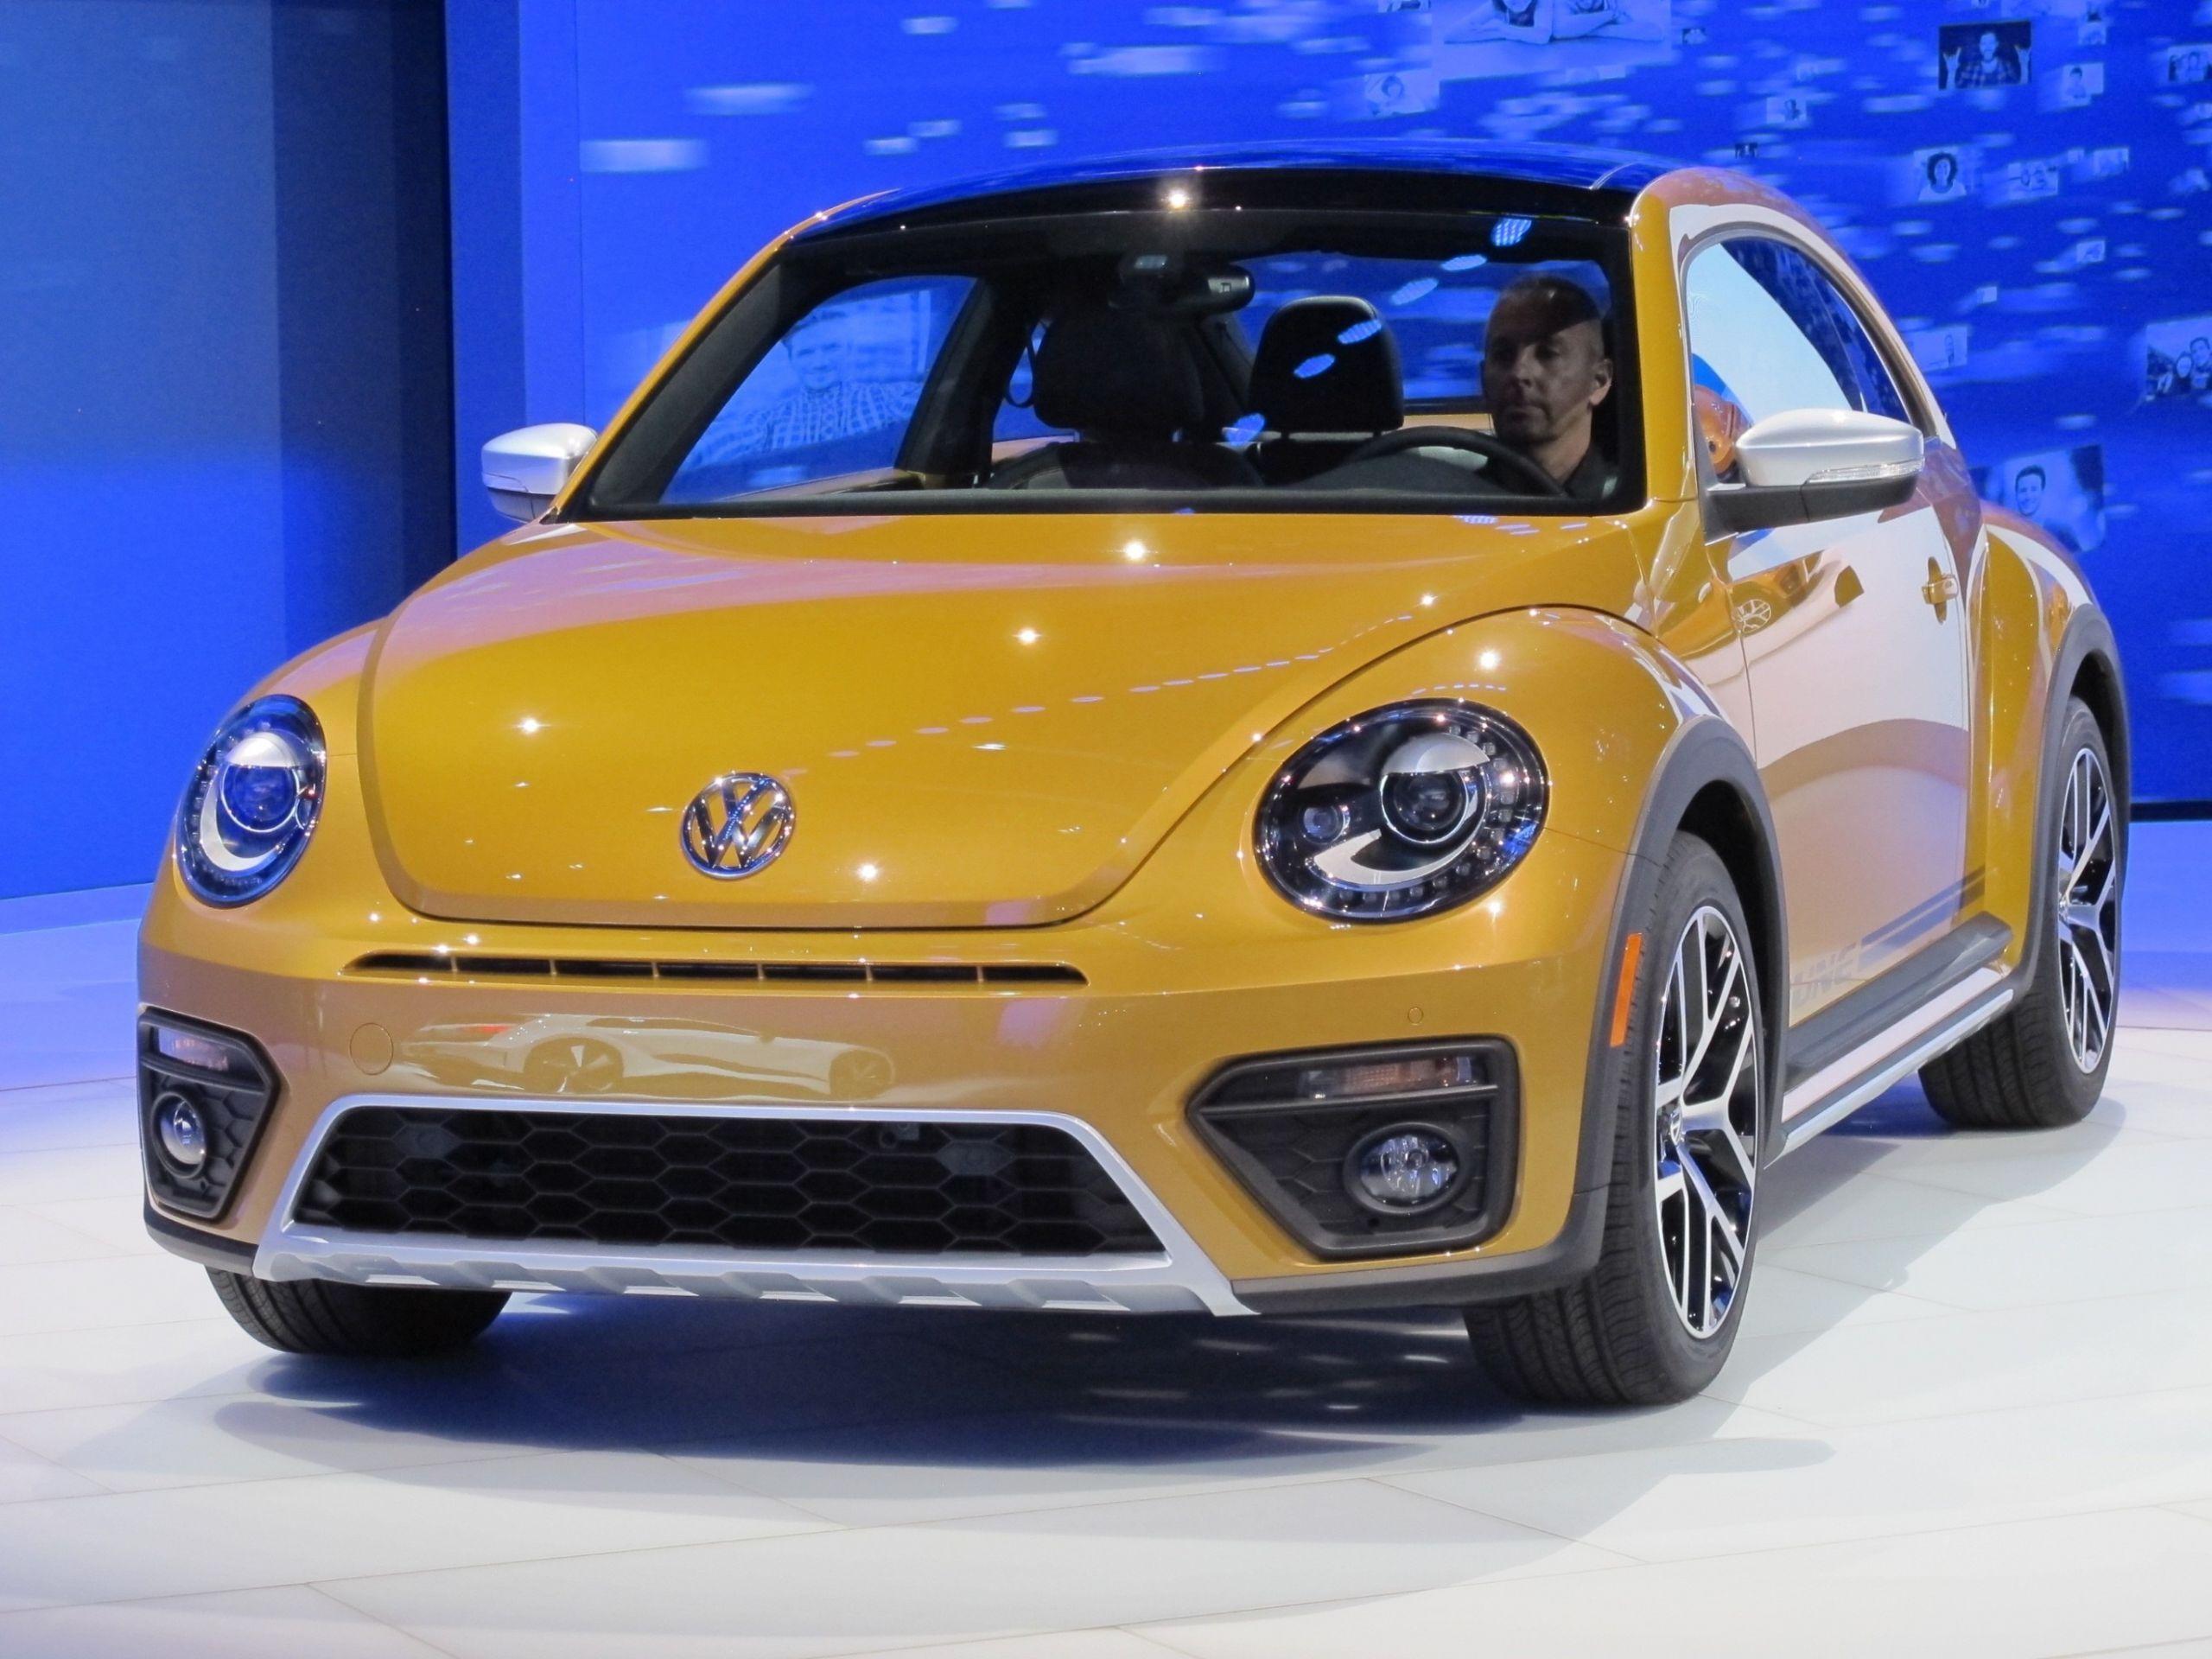 2021 Vw Beetle Dune Price